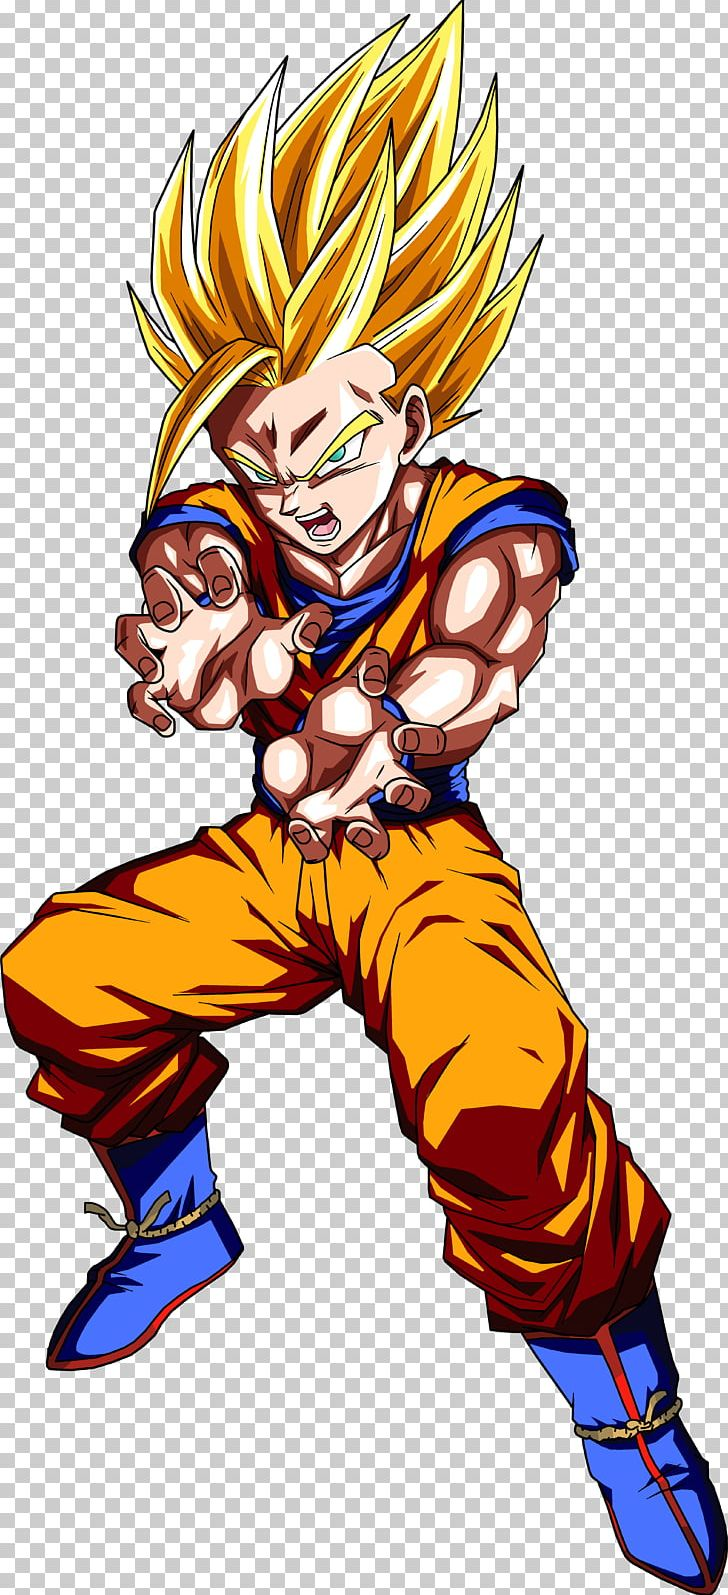 Gohan Krillin Bojack Goku Super Saiyan Png Clipart Anime